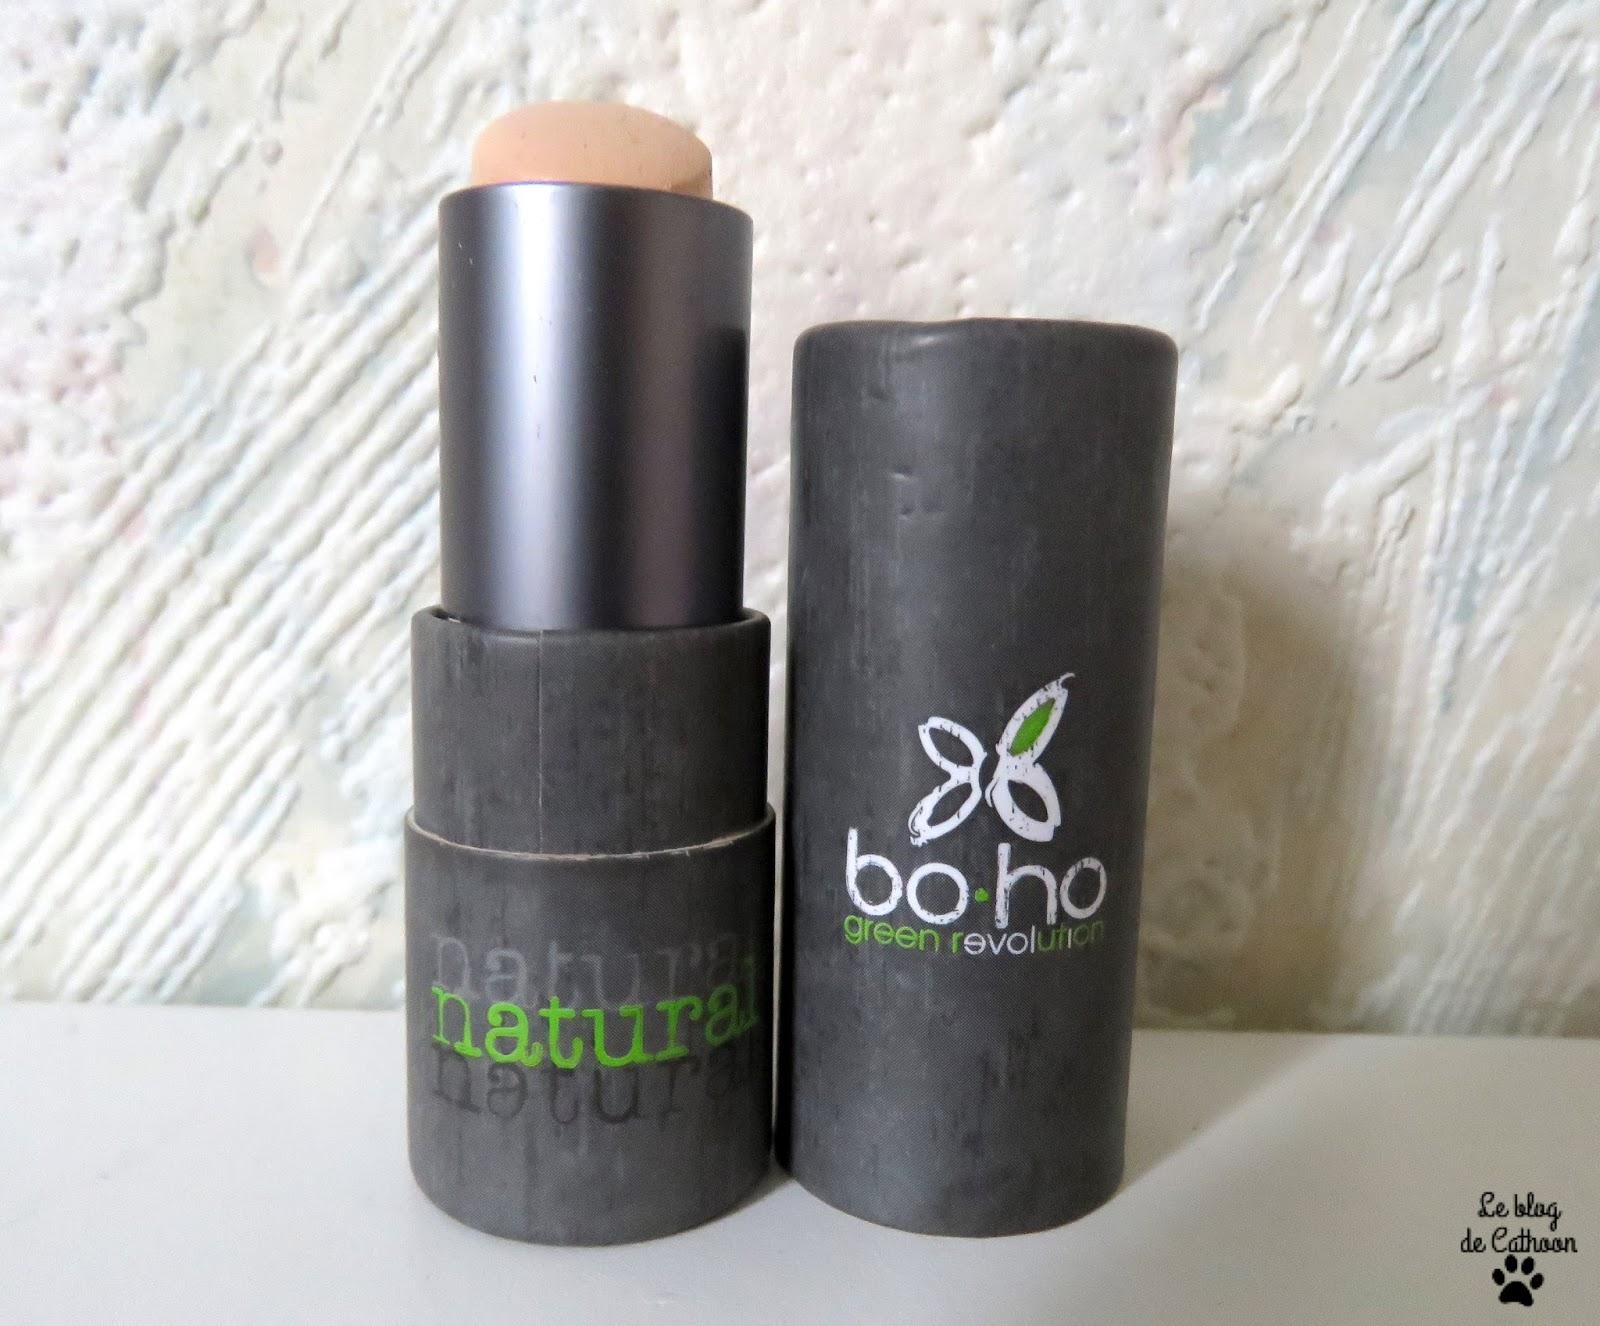 correcteur de Bo-ho Cosmetics, 01 beige diaphane